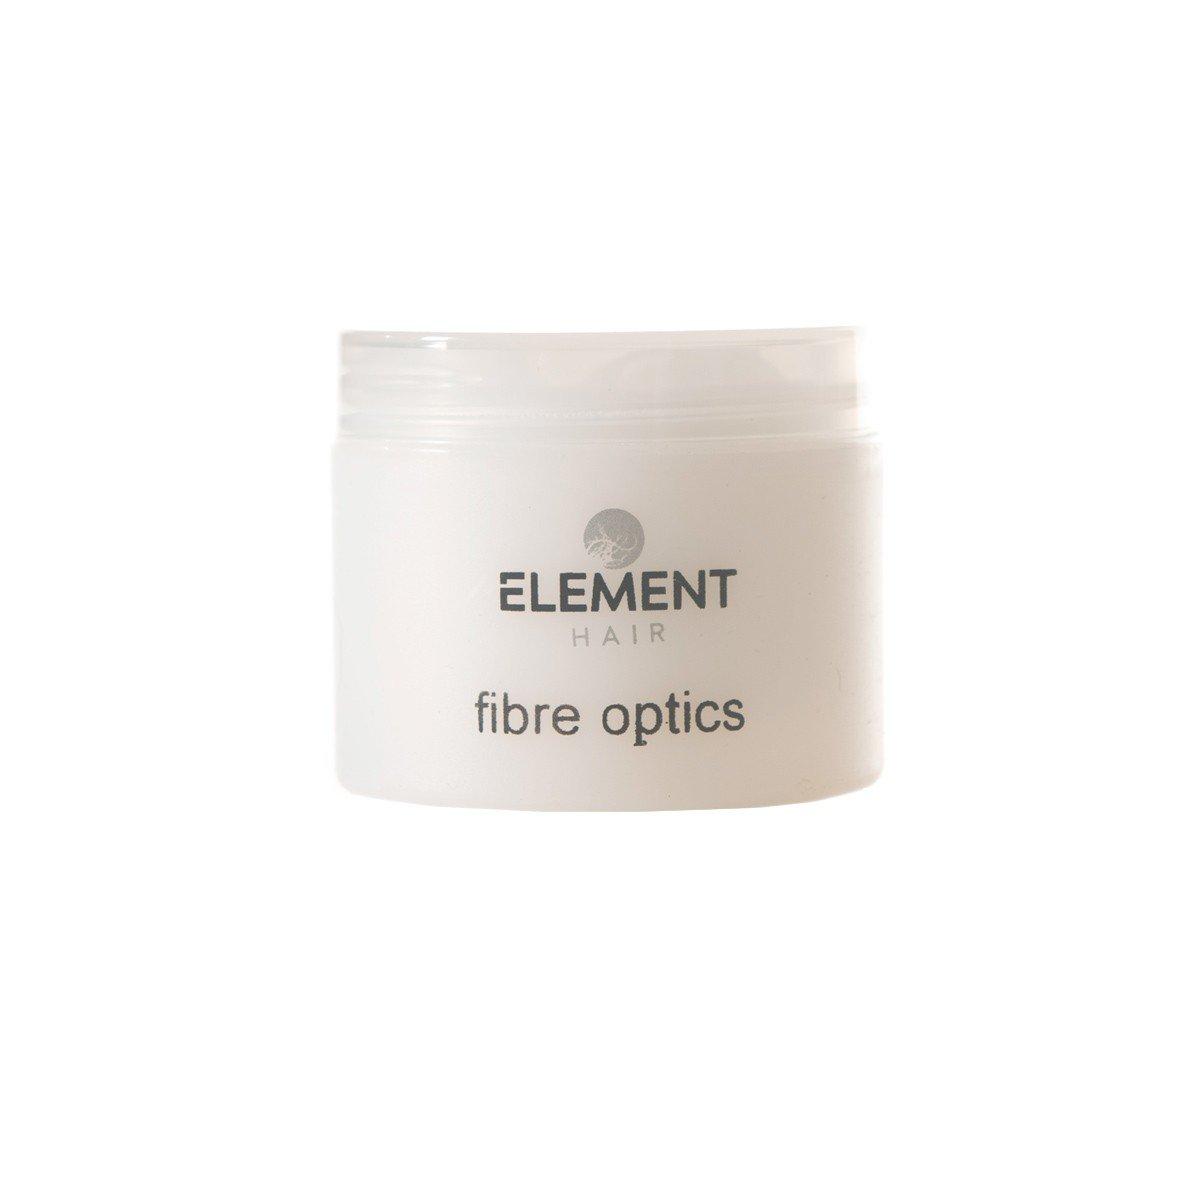 Fibre optics hair styling